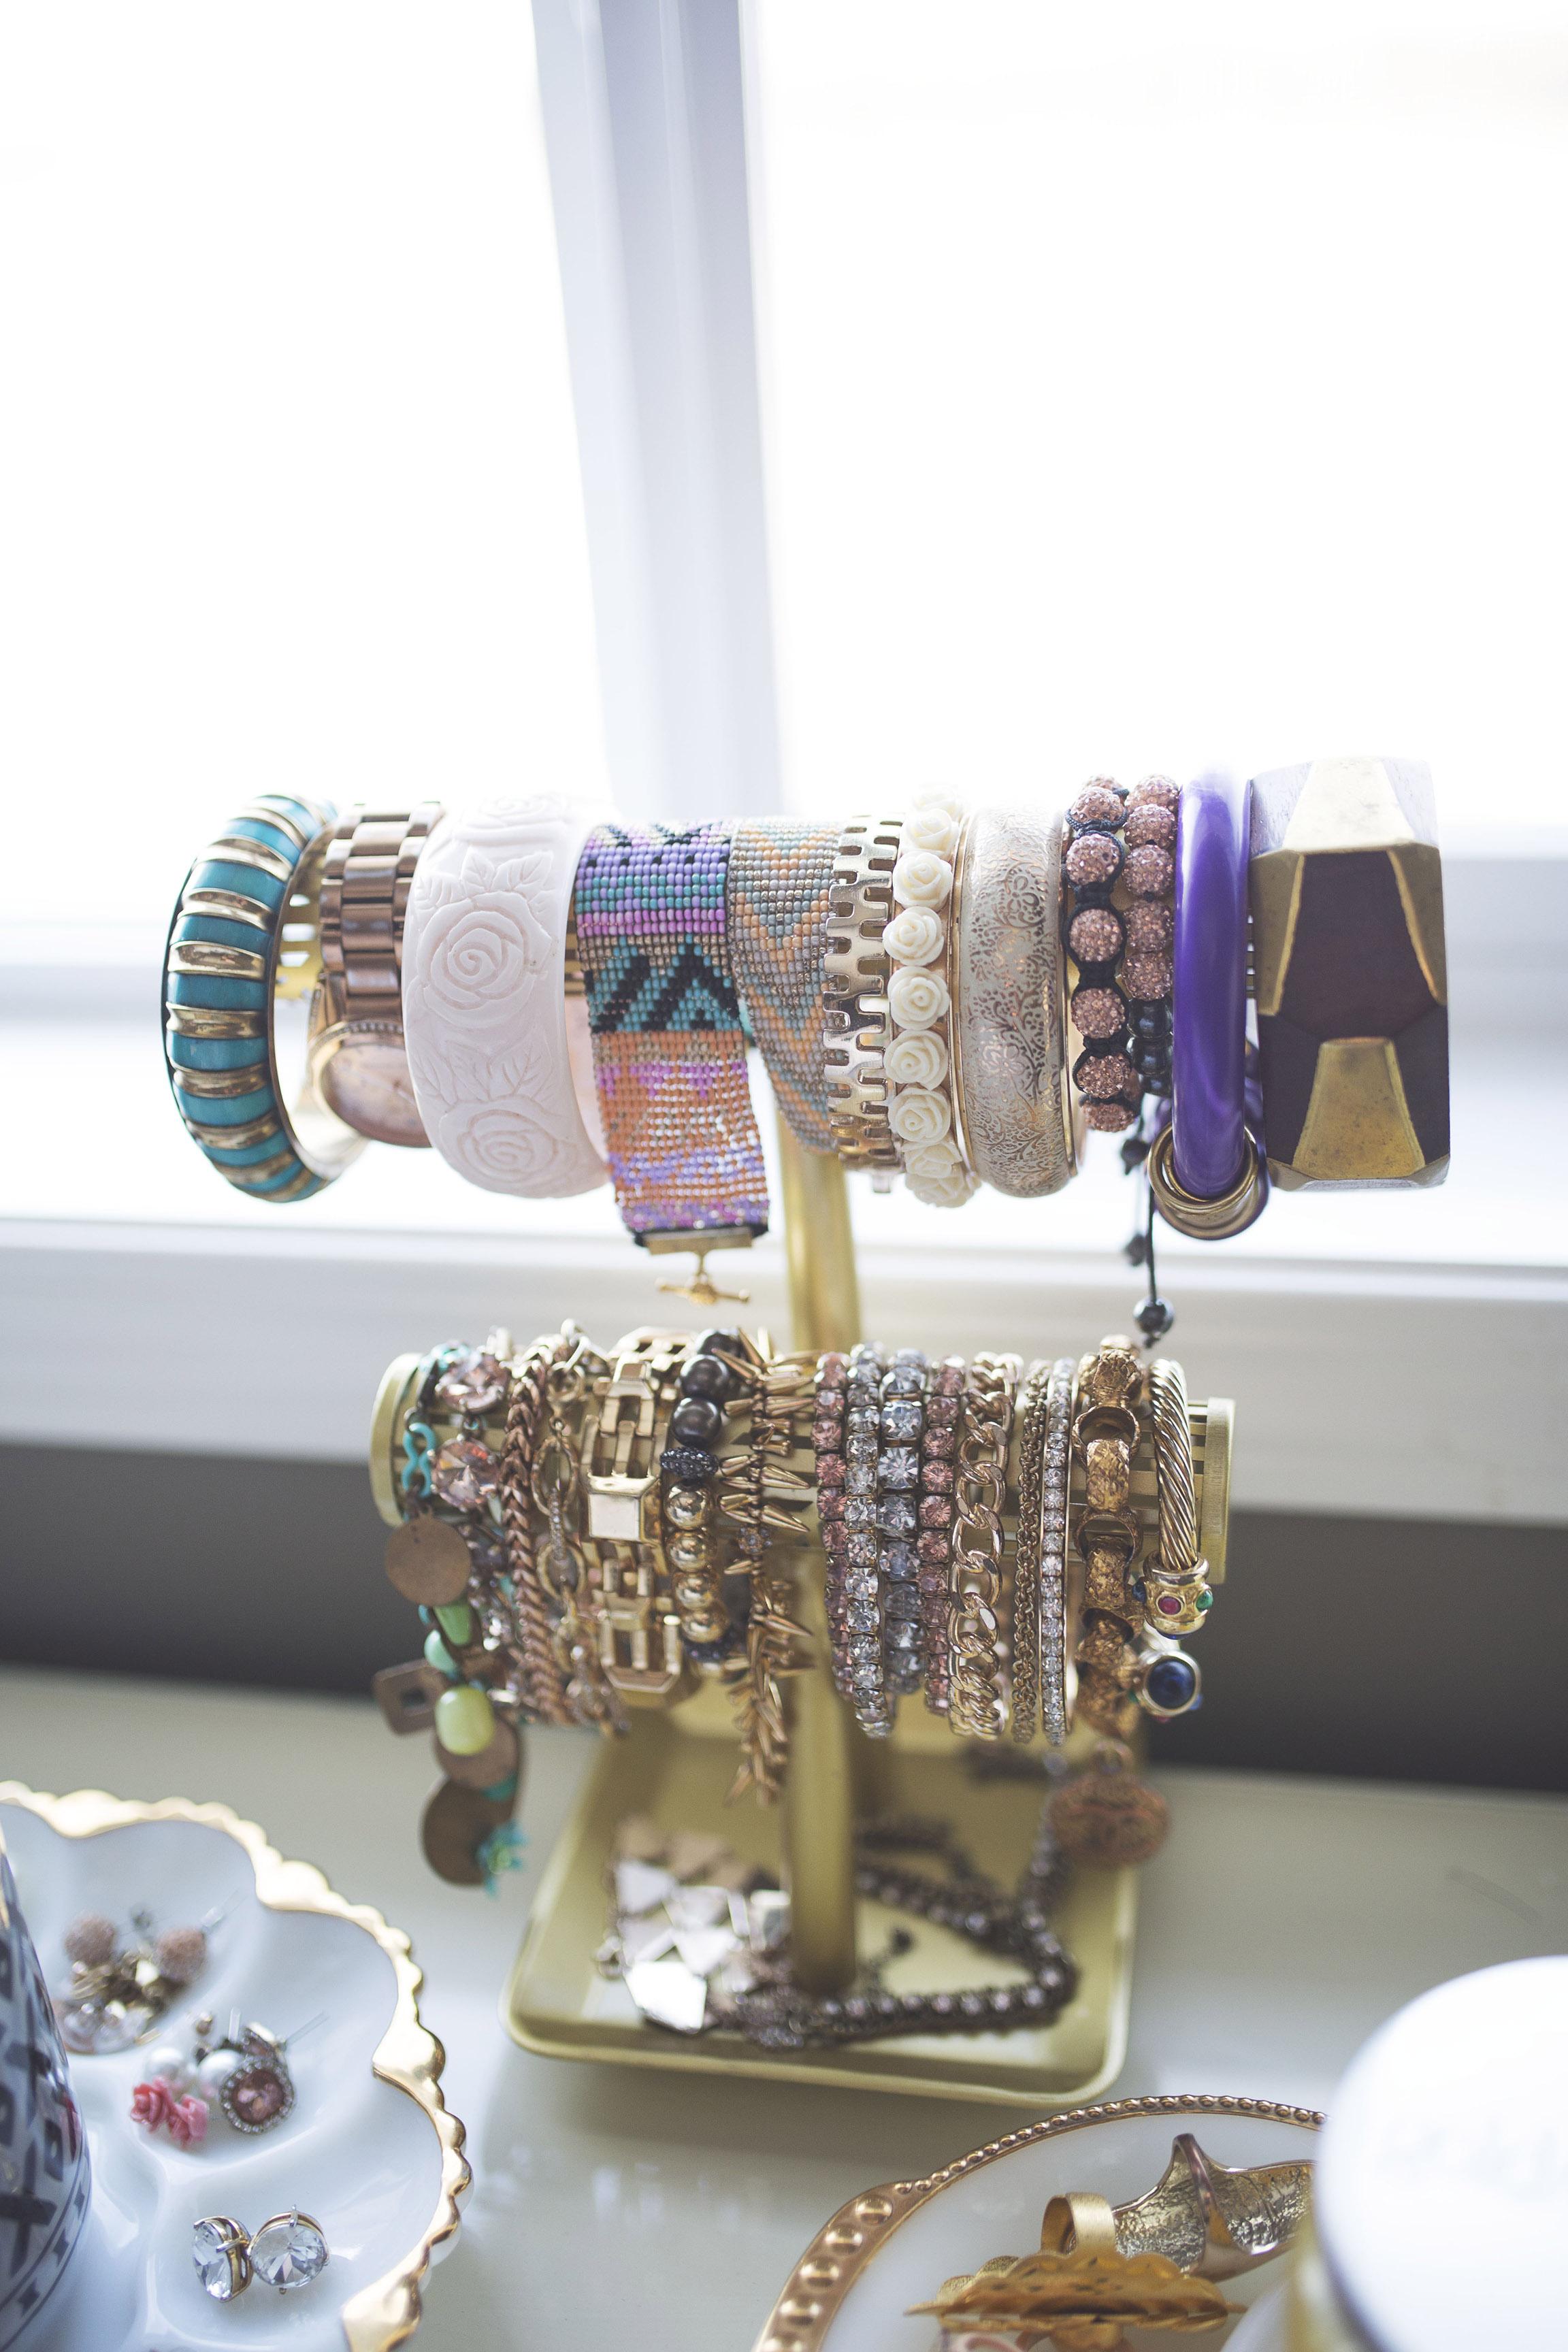 Desiree Martin jewellery storage ideas 6.jpg